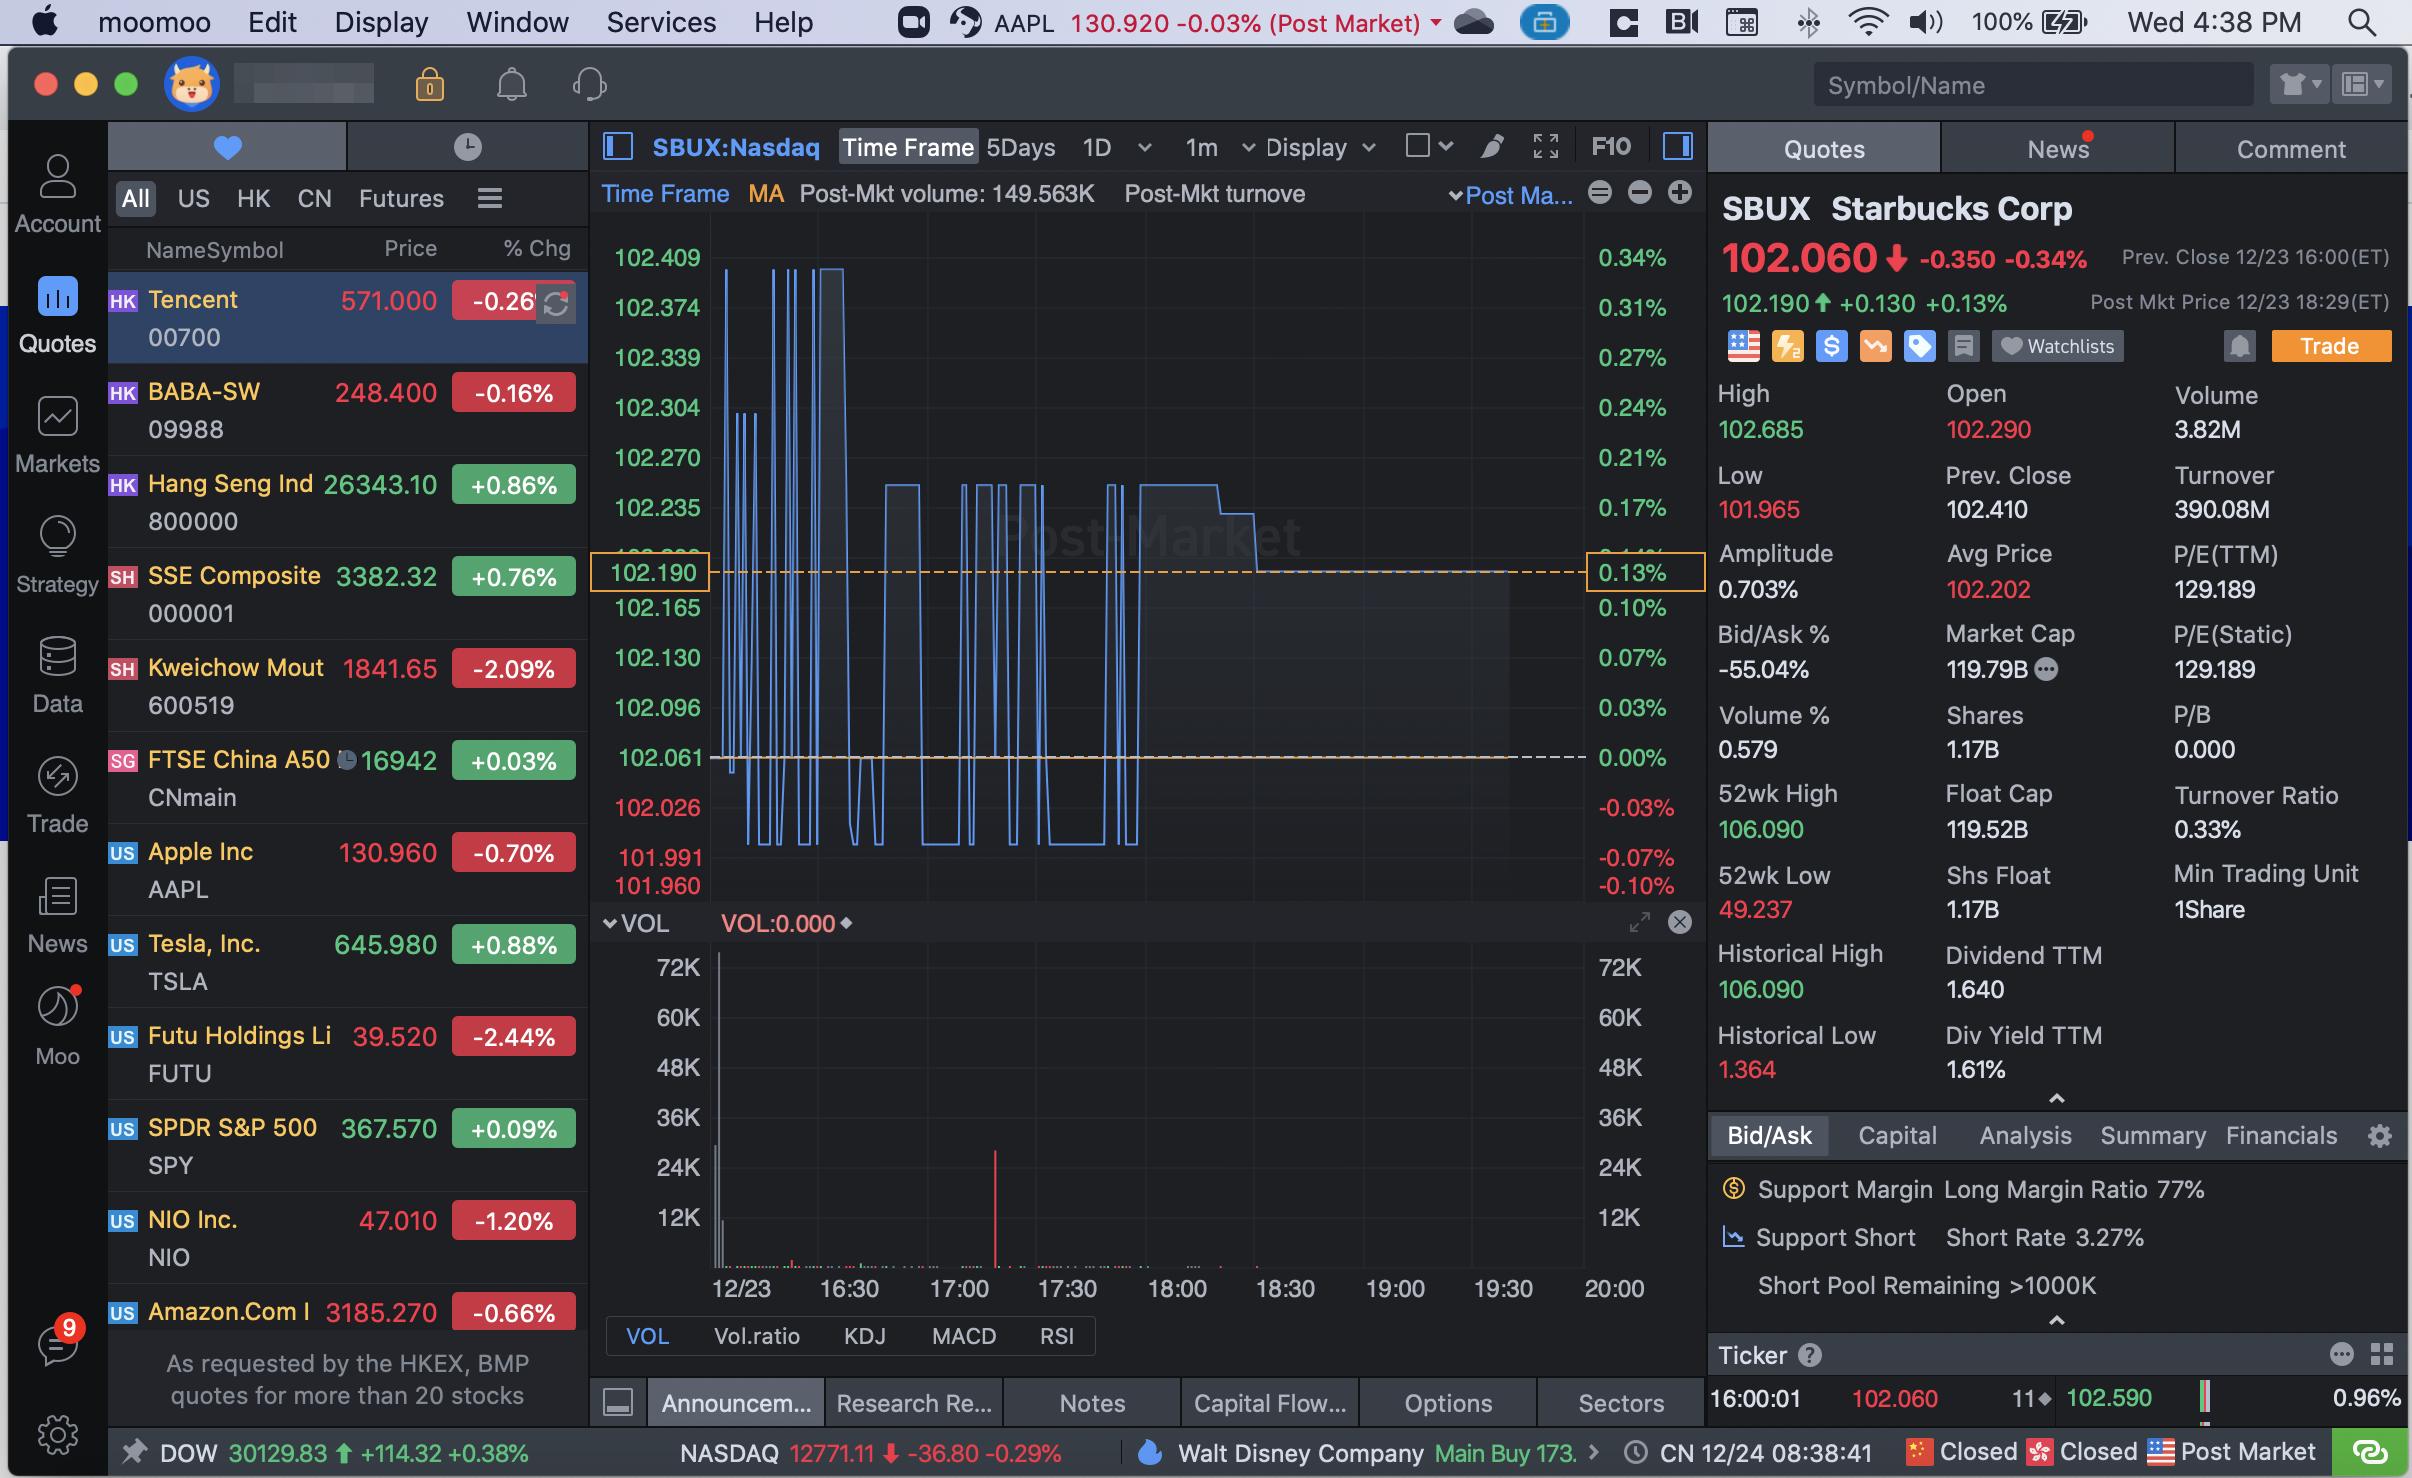 MooMoo review - Desktop trading platform